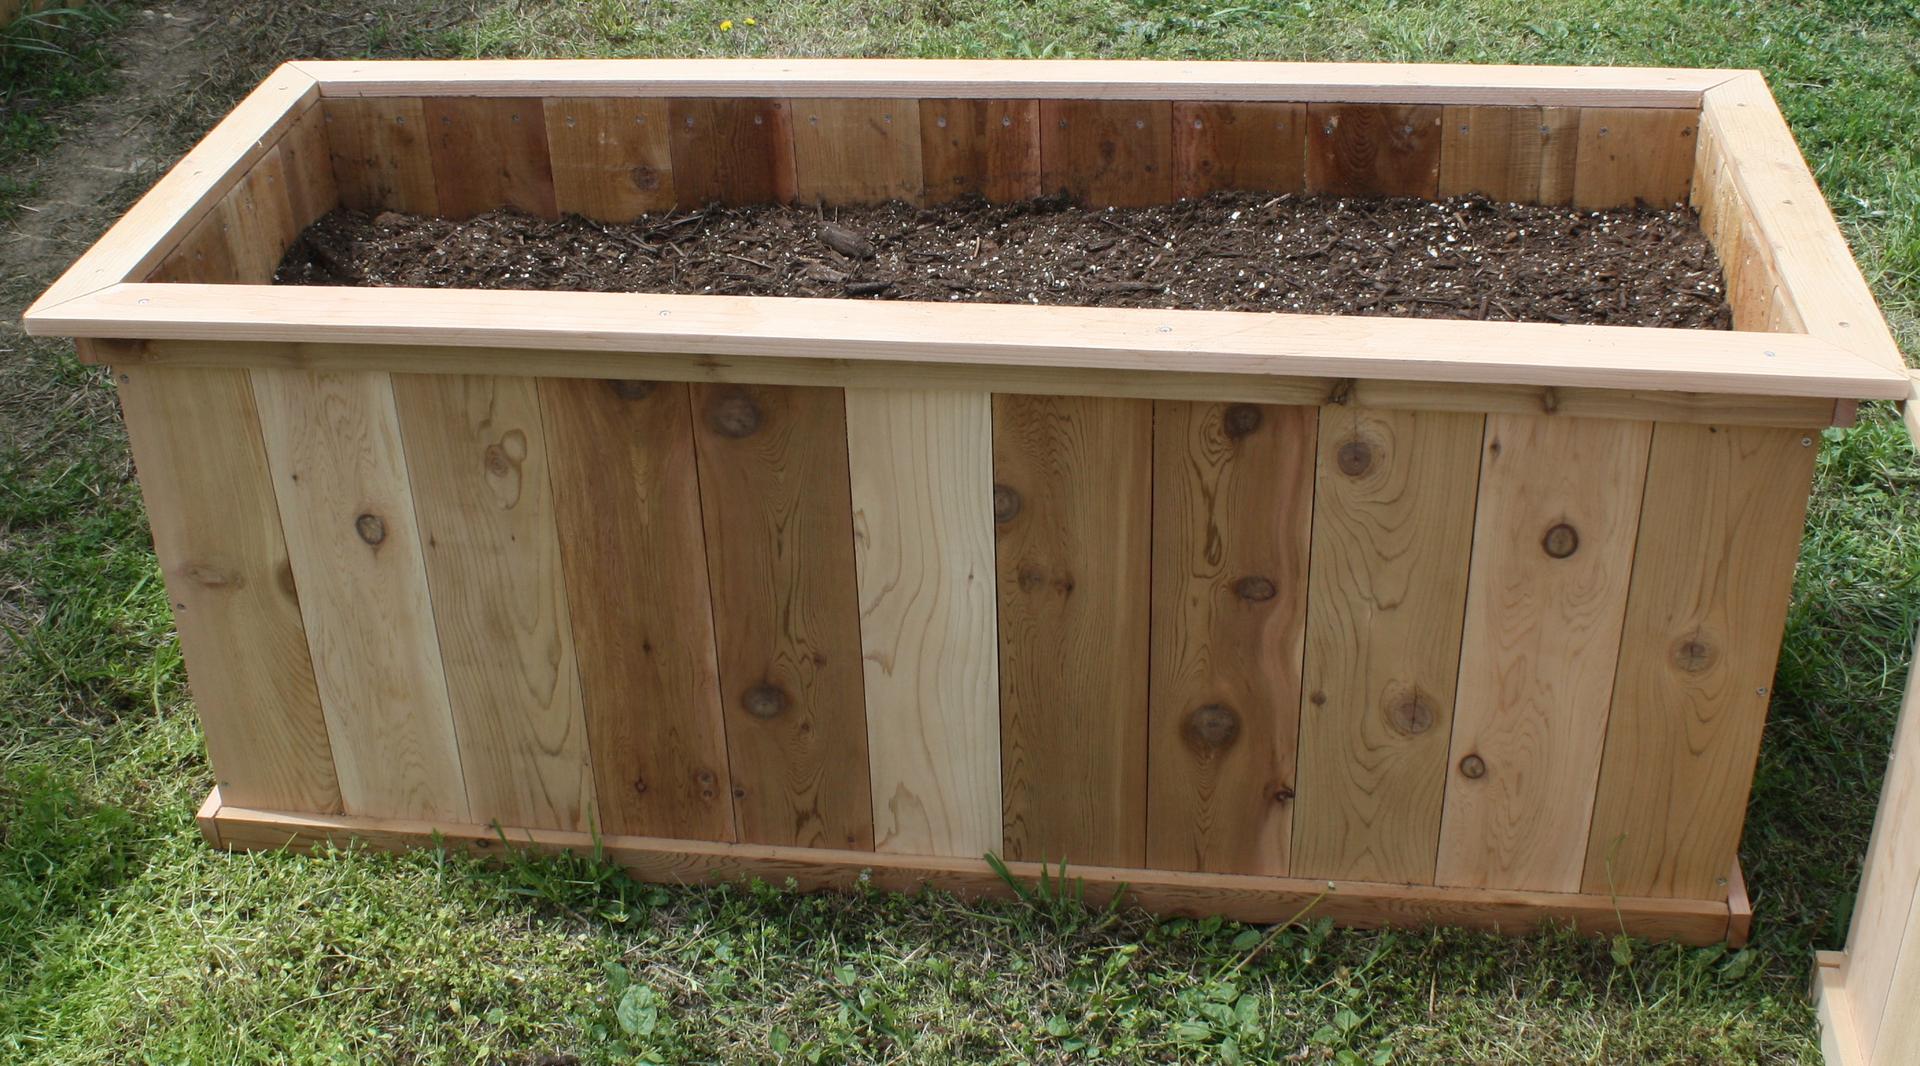 box pdf diy ing demandit org window cedar vancouver rectangular wood north planter plans boxes